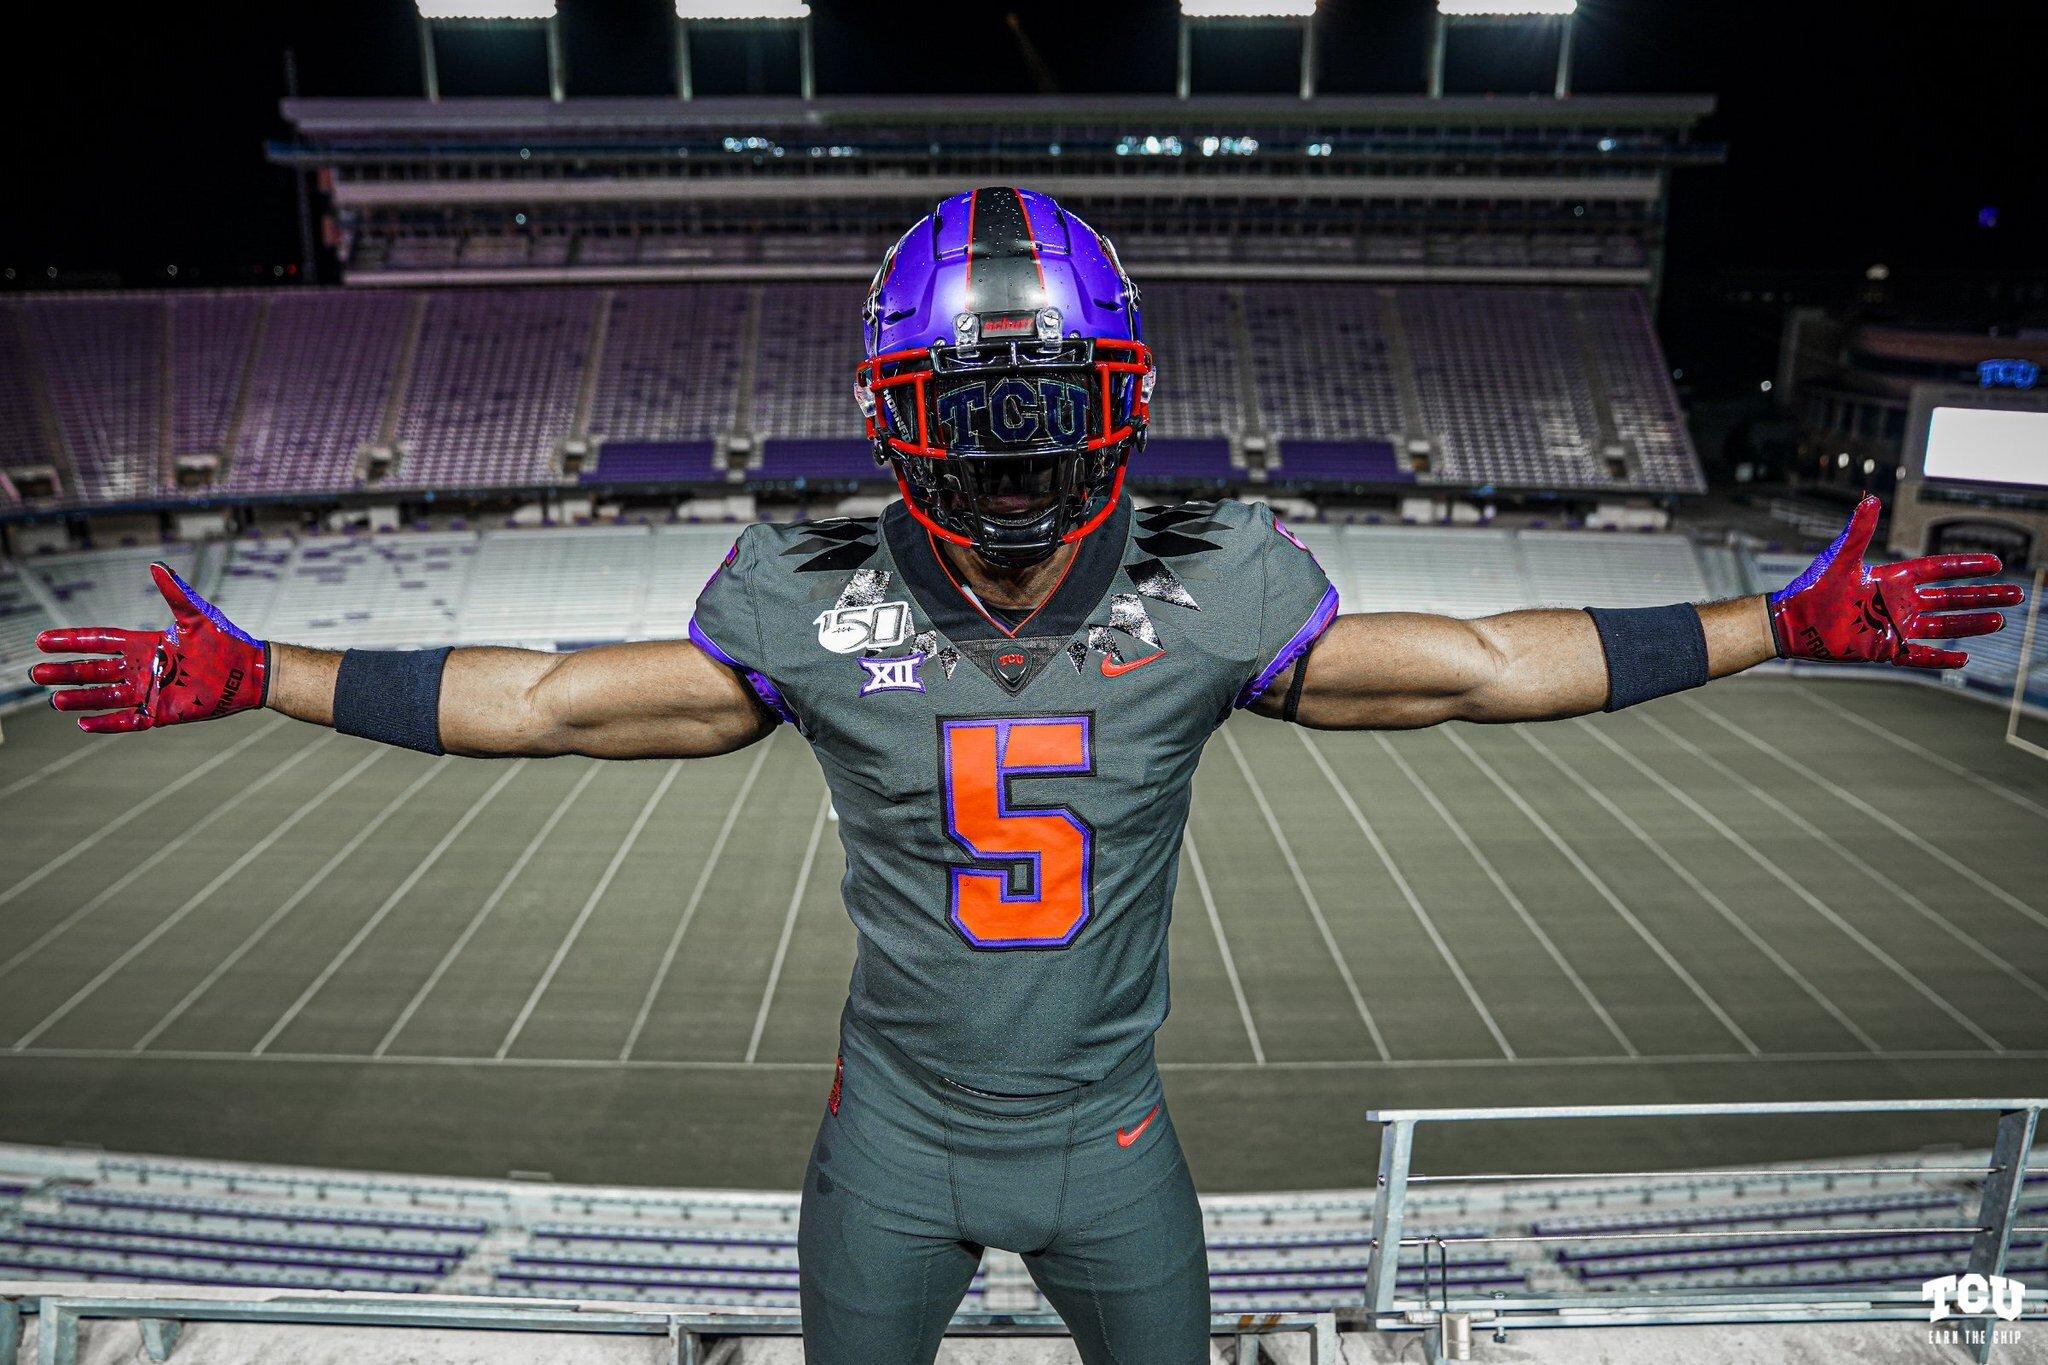 Top 10 College Football Alternate Uniforms